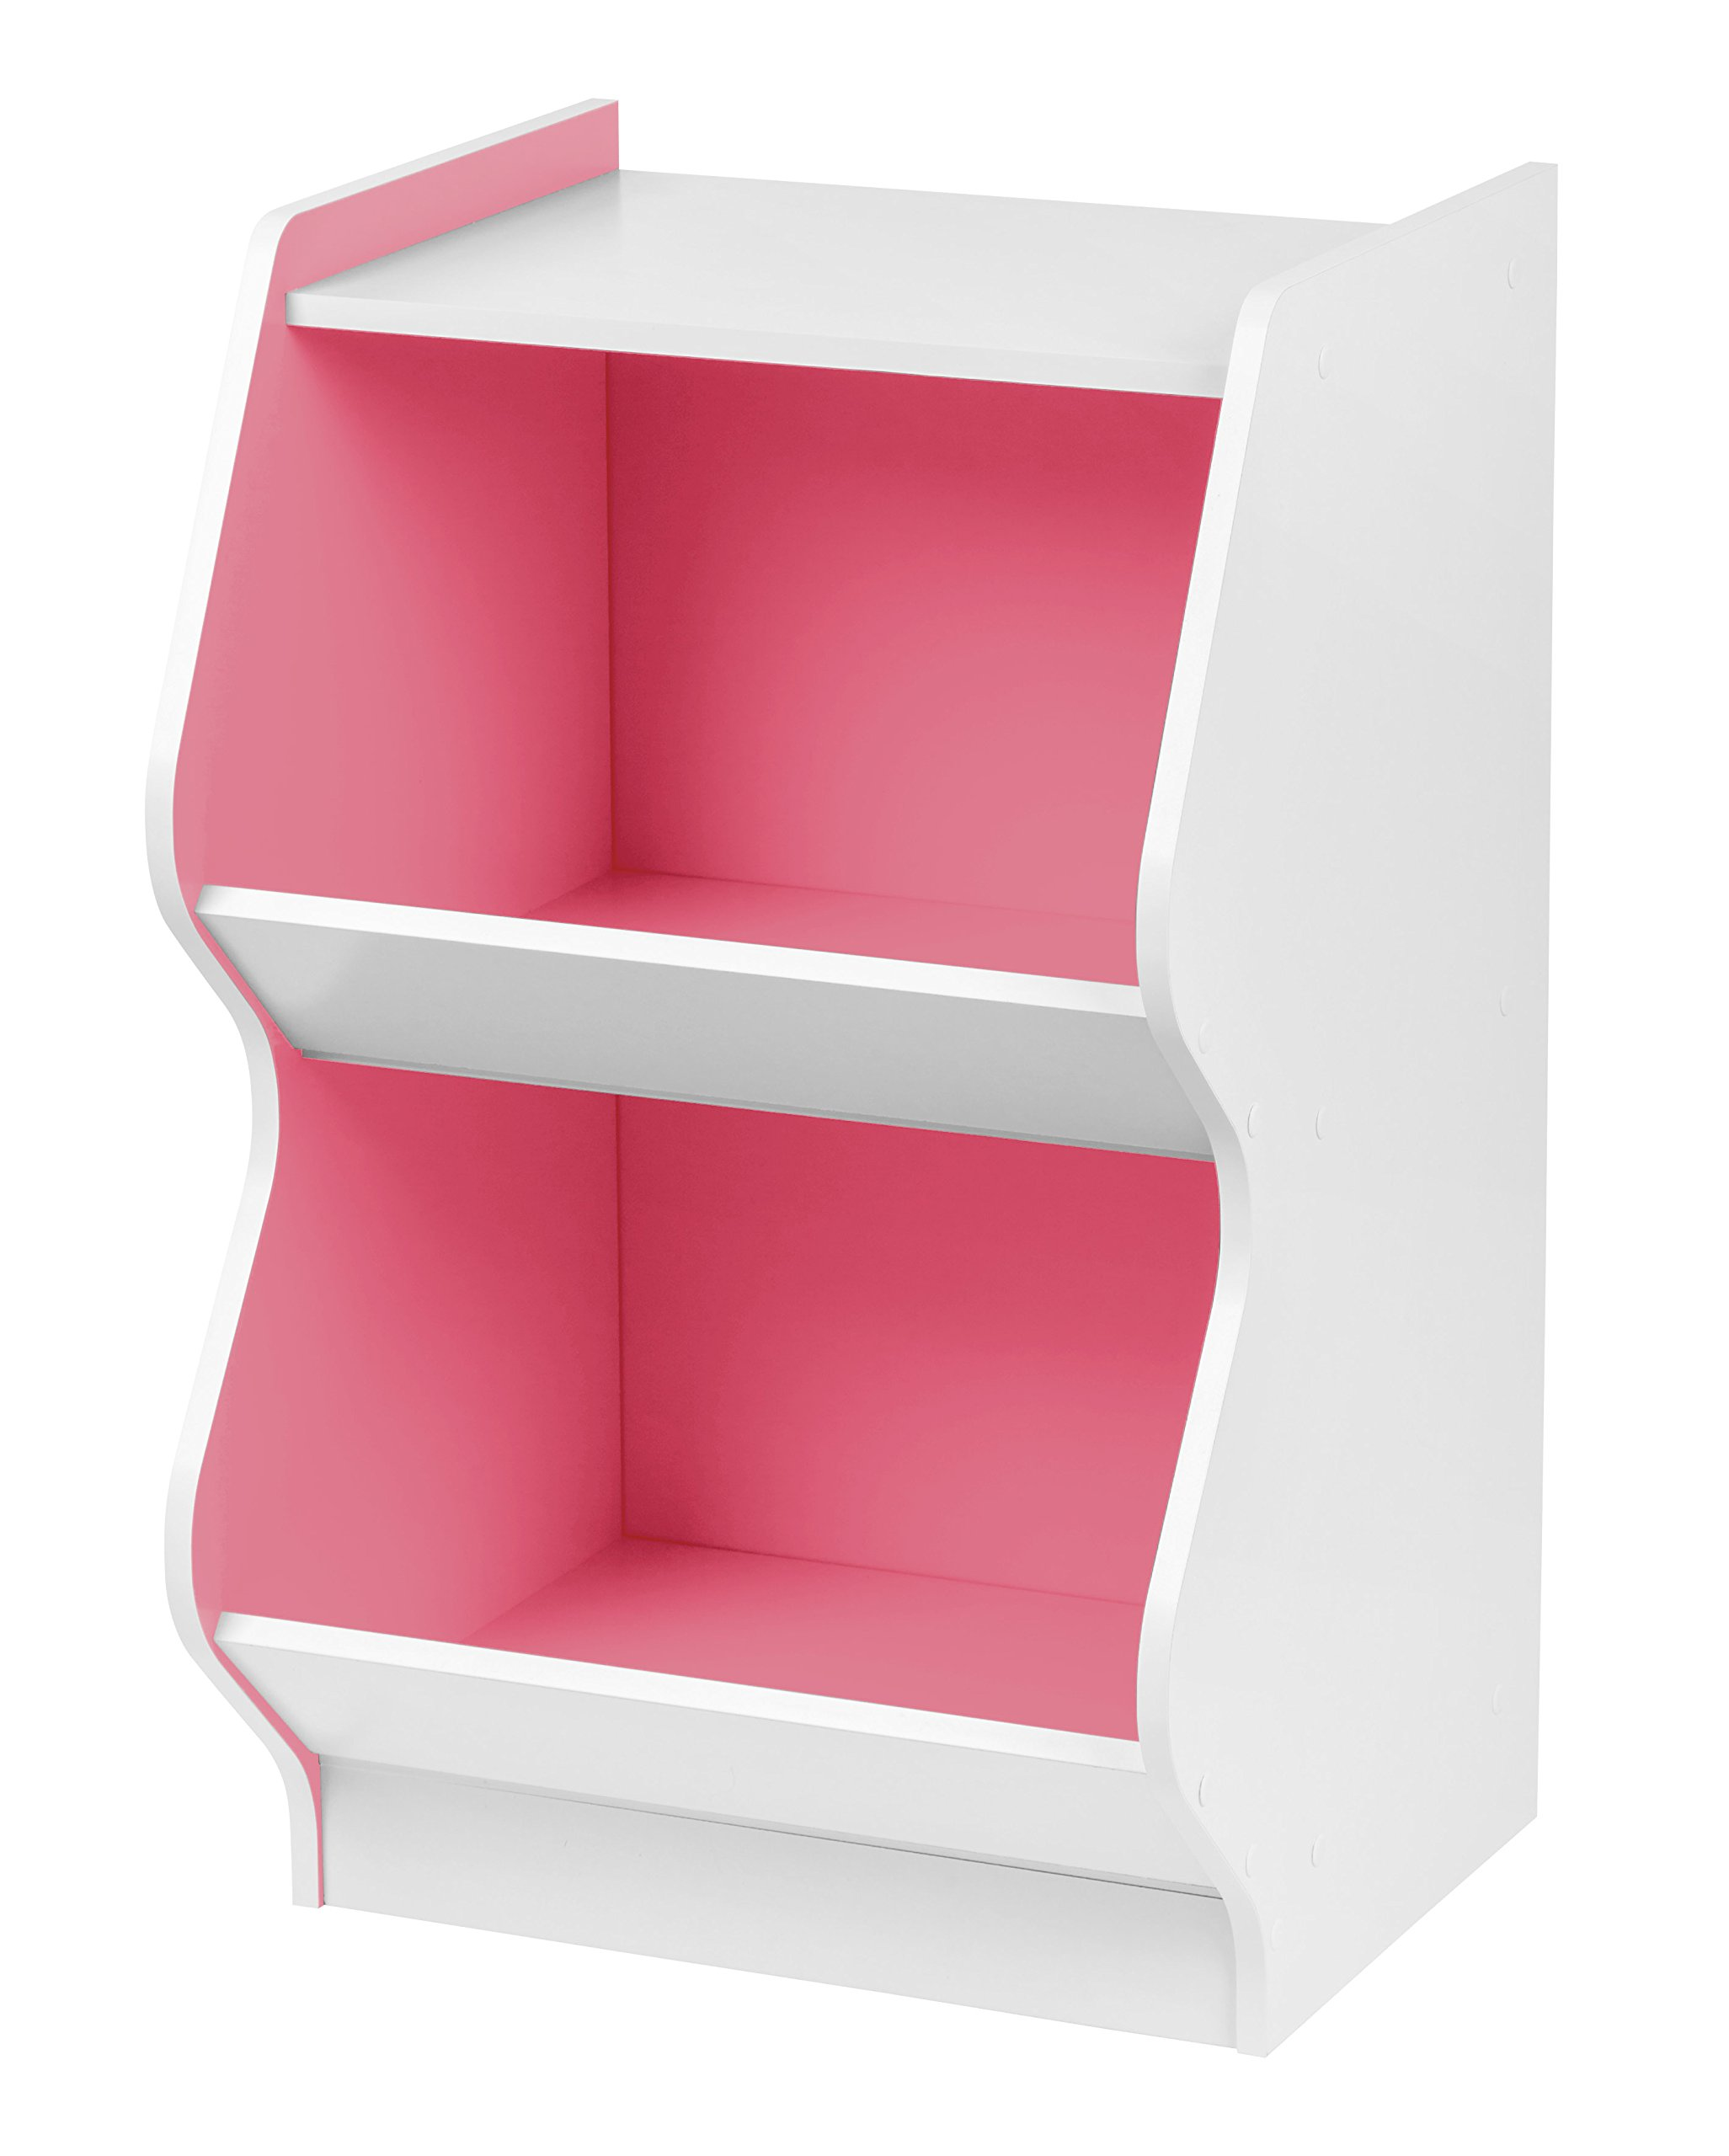 IRIS 2 Tier Curved Edge Storage Shelf, White and Pink by IRIS USA, Inc.